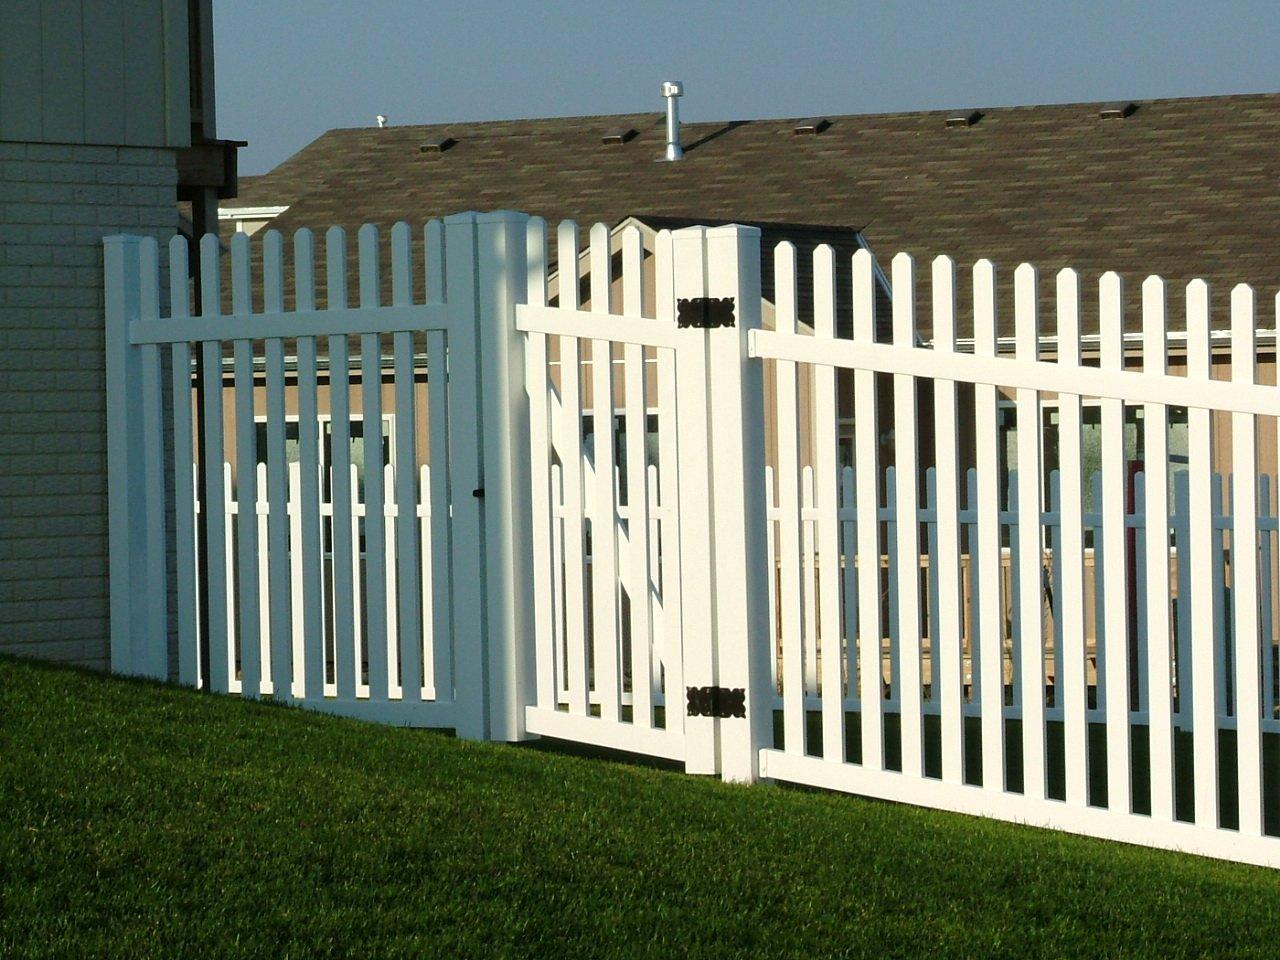 Dakota Fence & Deck 6' white pvc picket - Omaha and Papillion, Nebraska